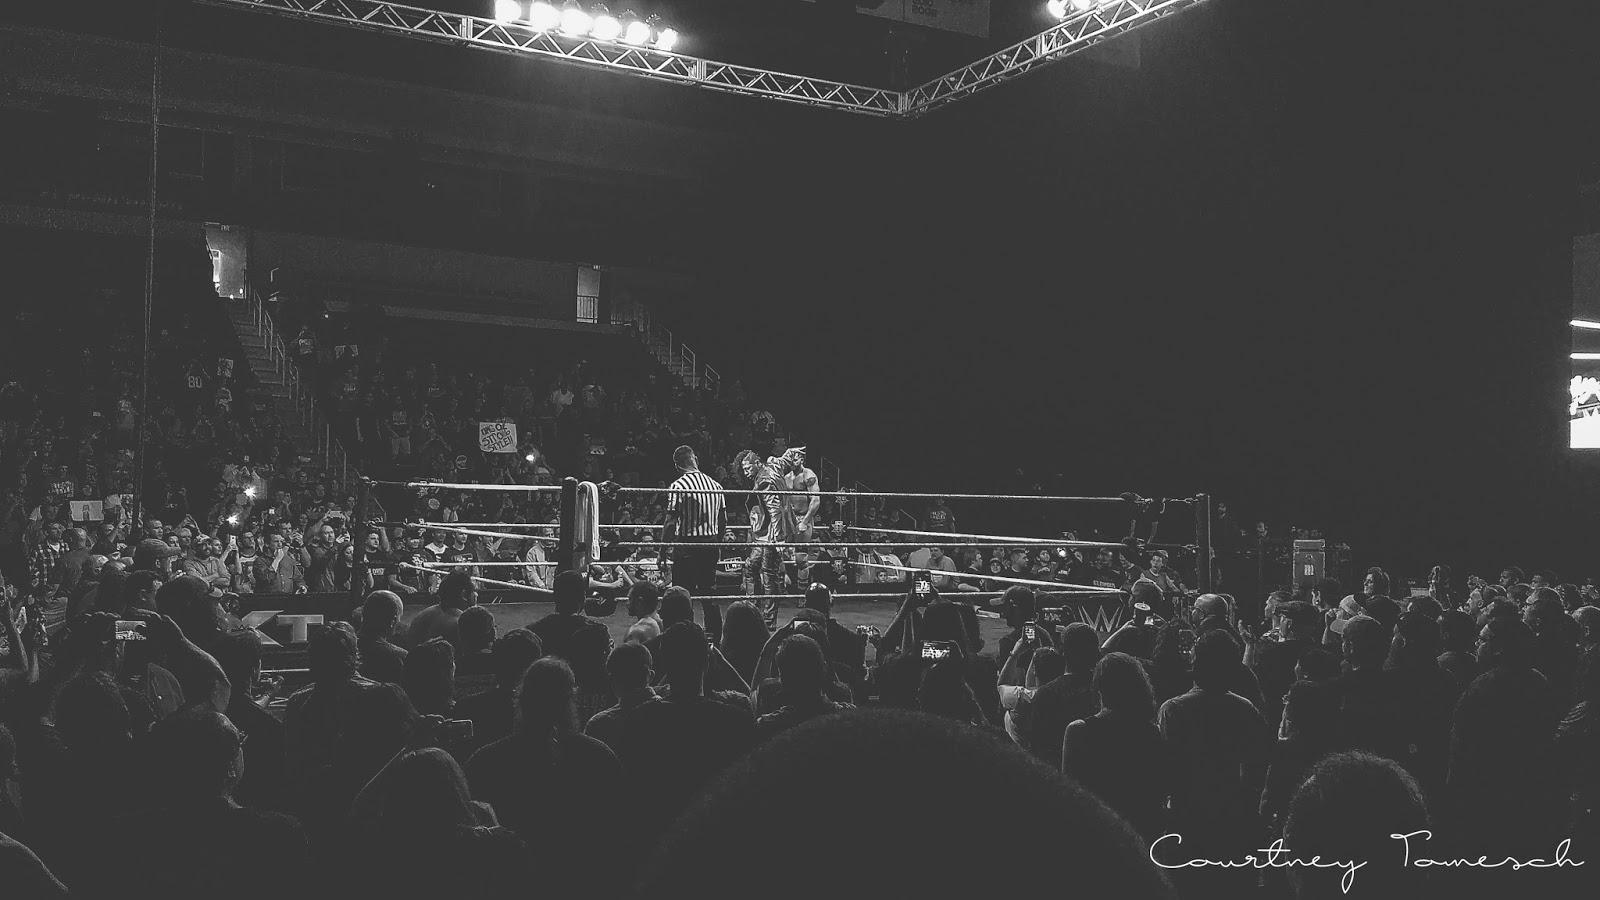 Courtney Tomesch NXT Live Norfolk Shinsuke Nakamura